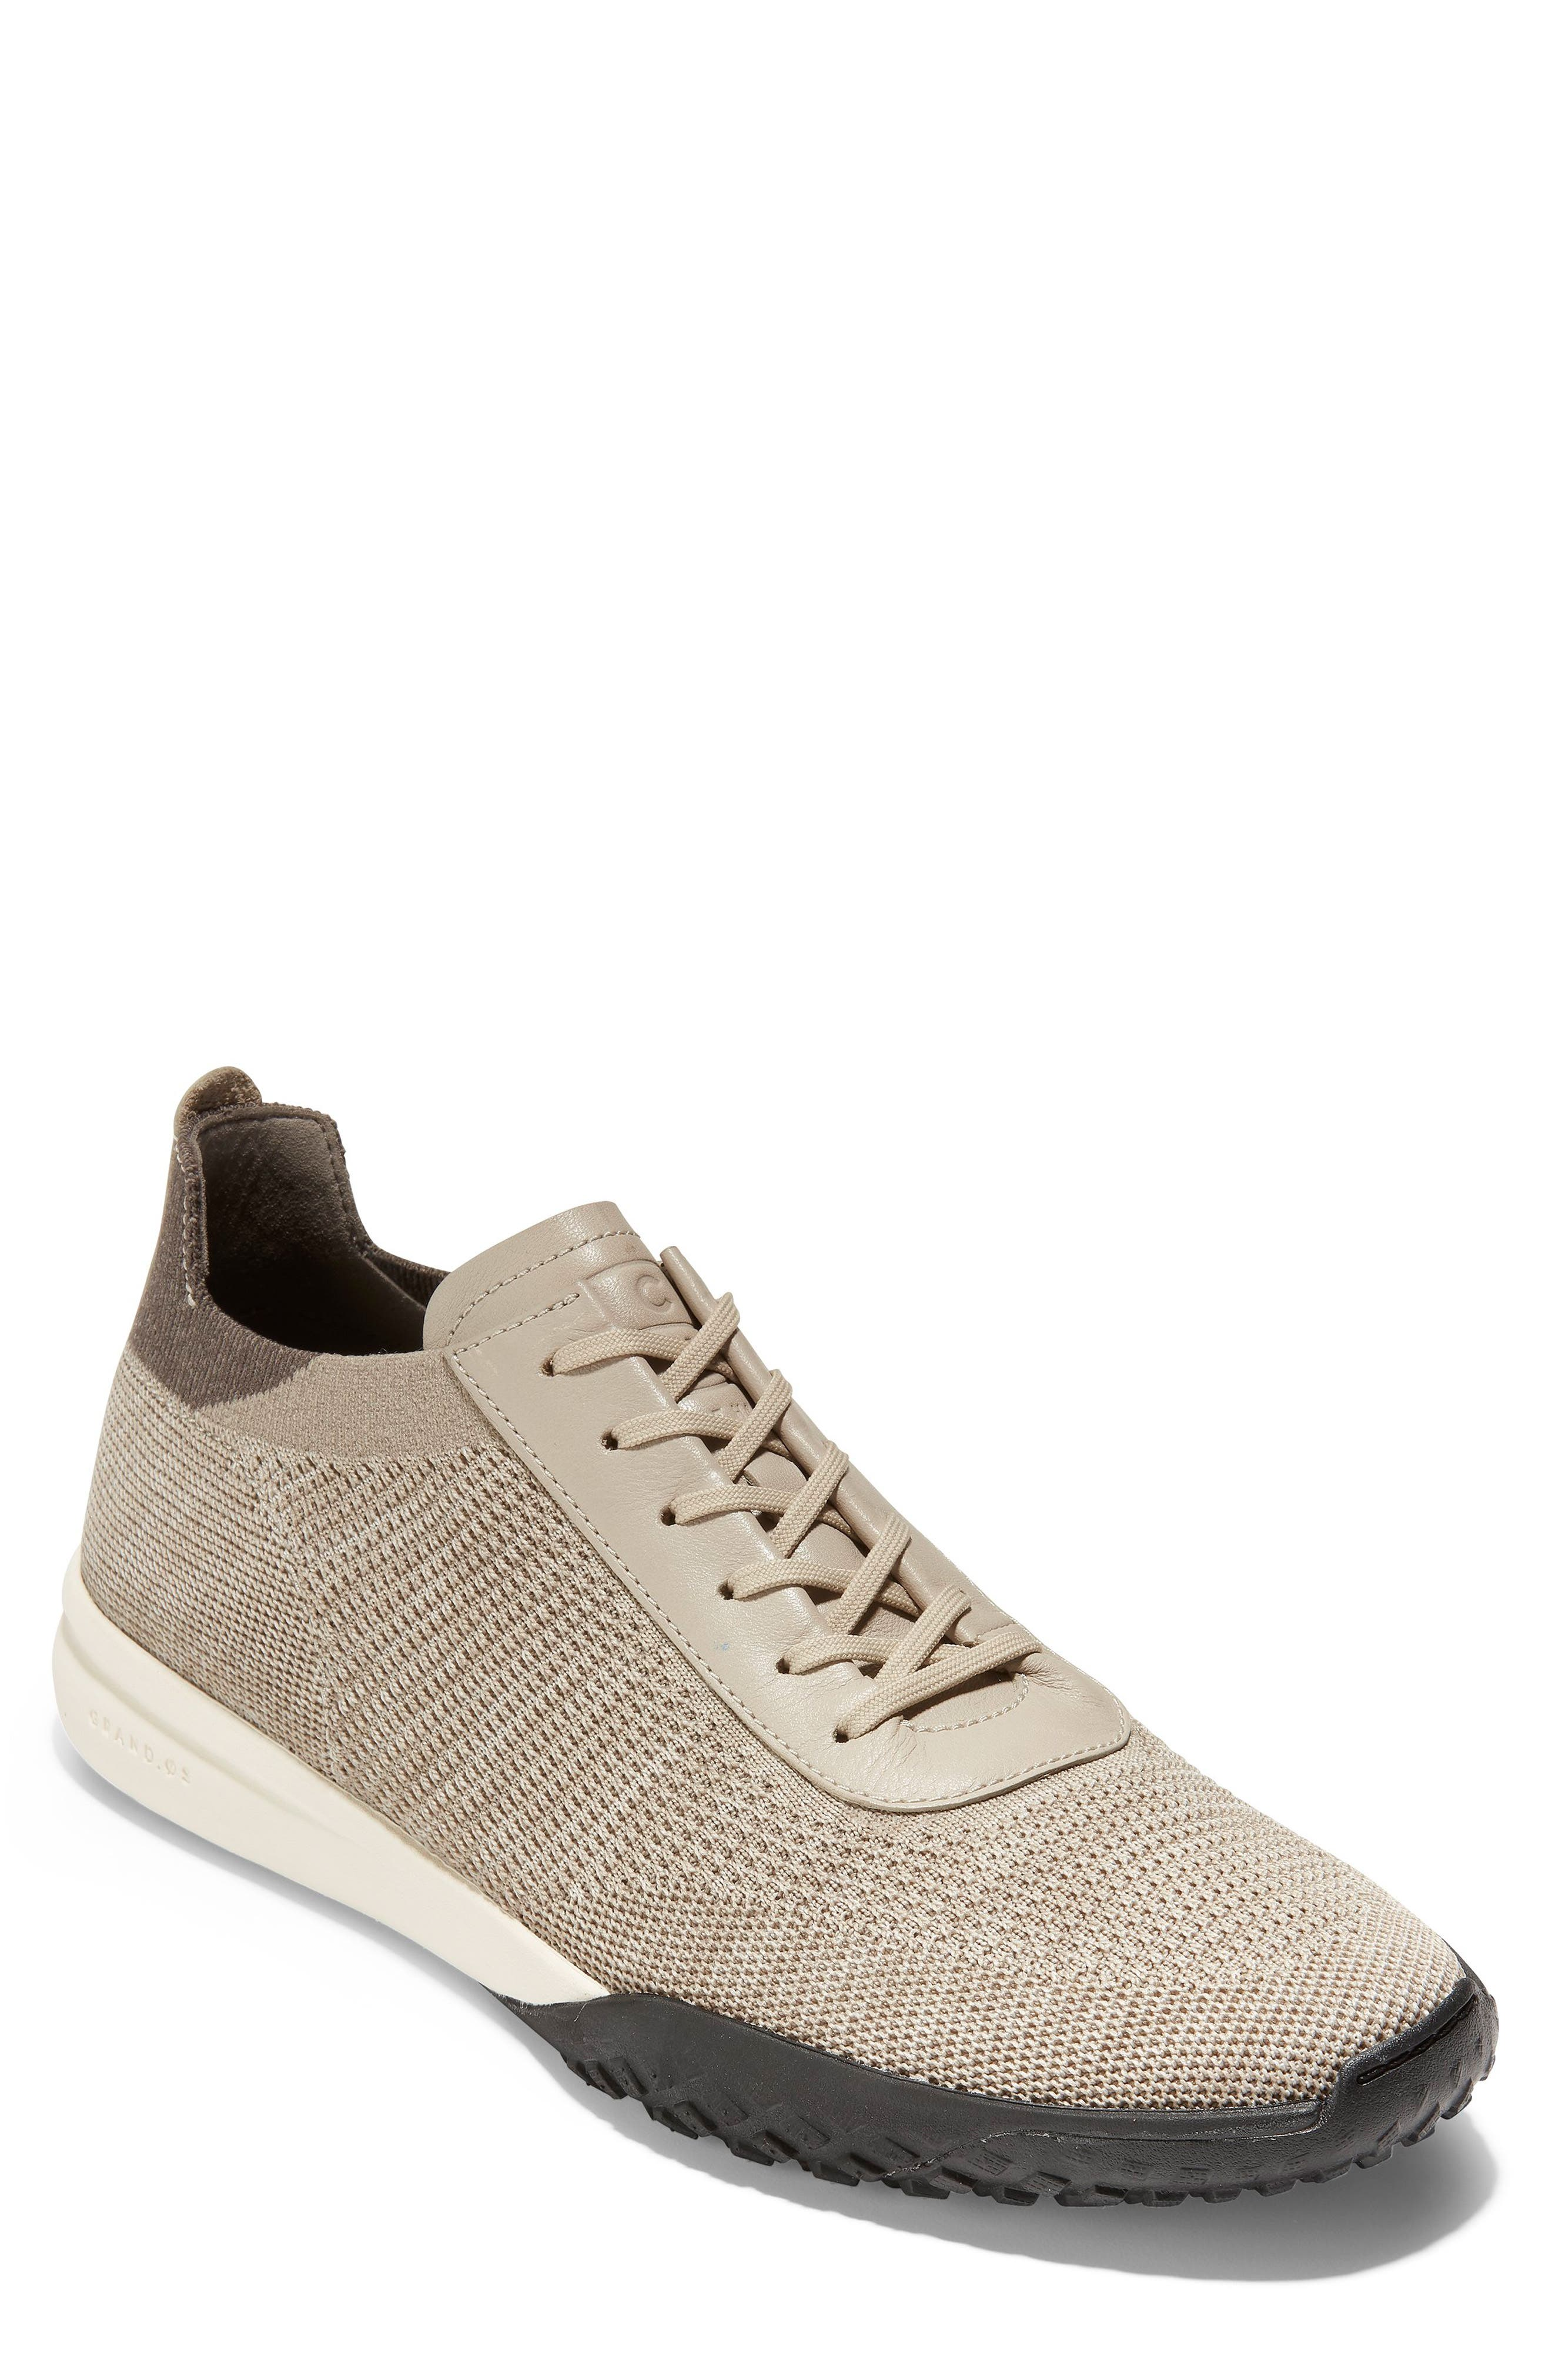 143237fe0ed7 Cole Haan Grandpro Trail Low Stitchlite Sneaker